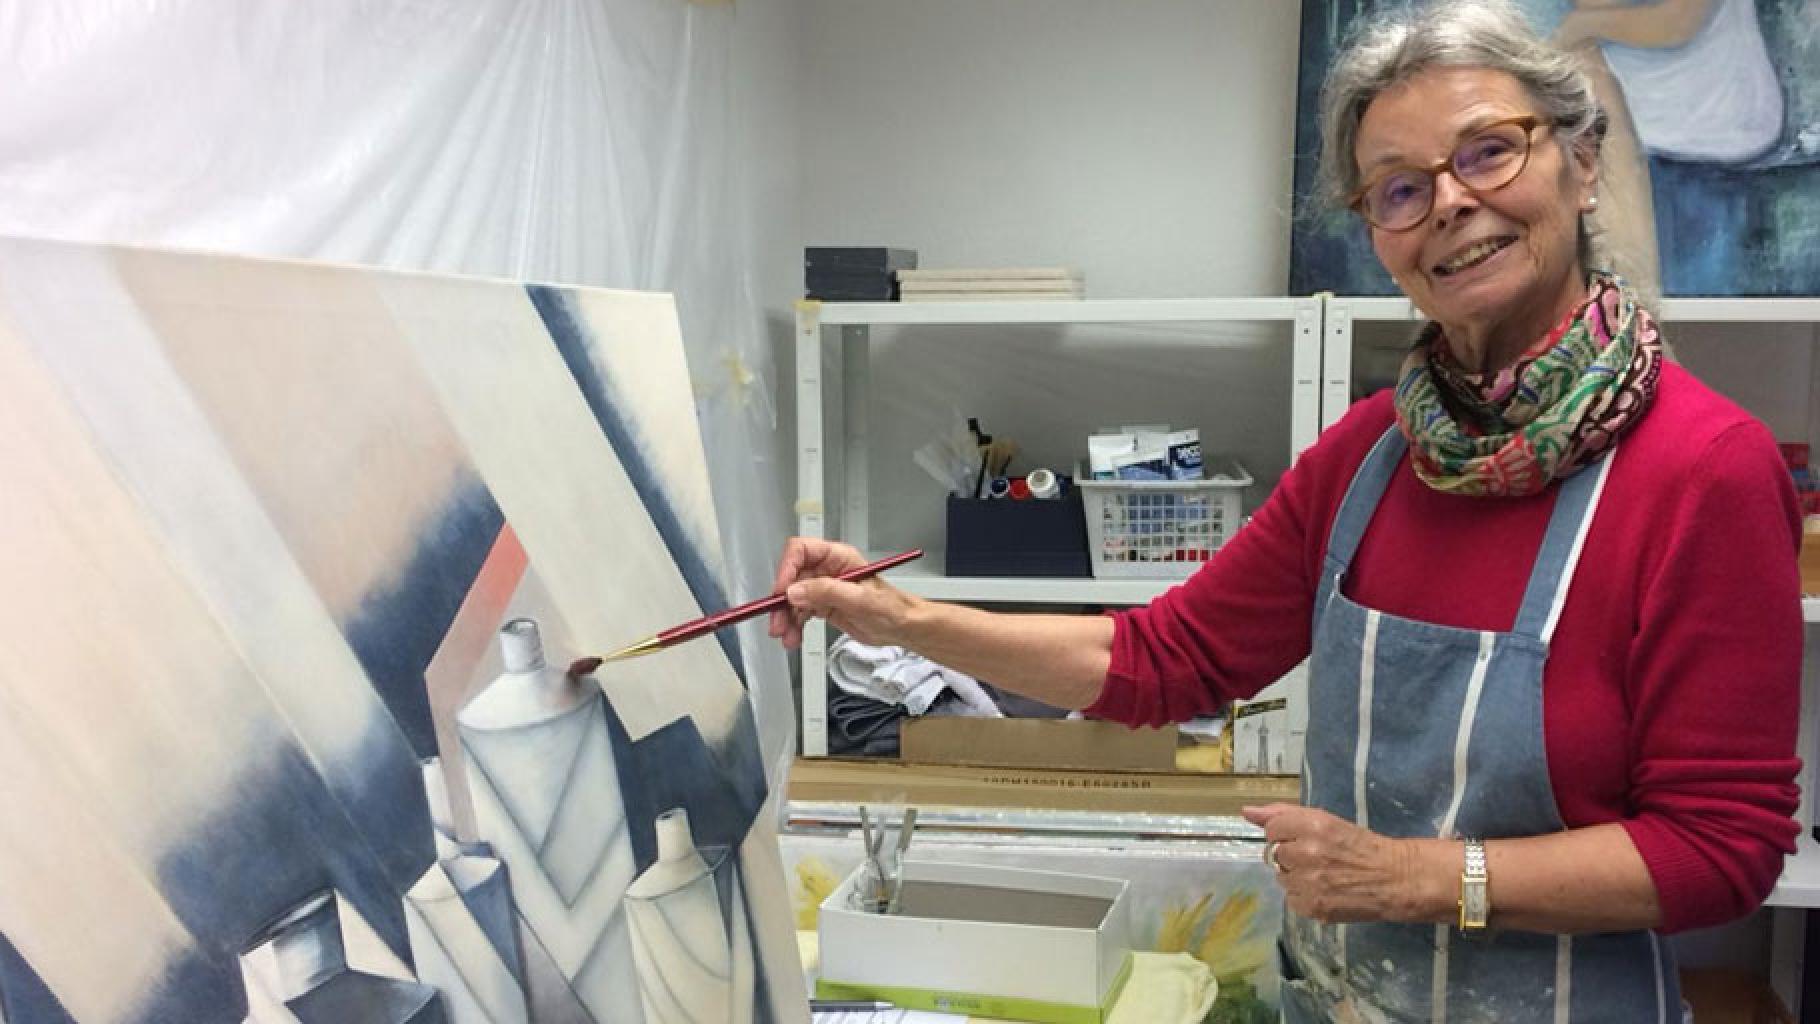 Die Künstlerin Rosemarie Salz im Oxfam Shop Bonn